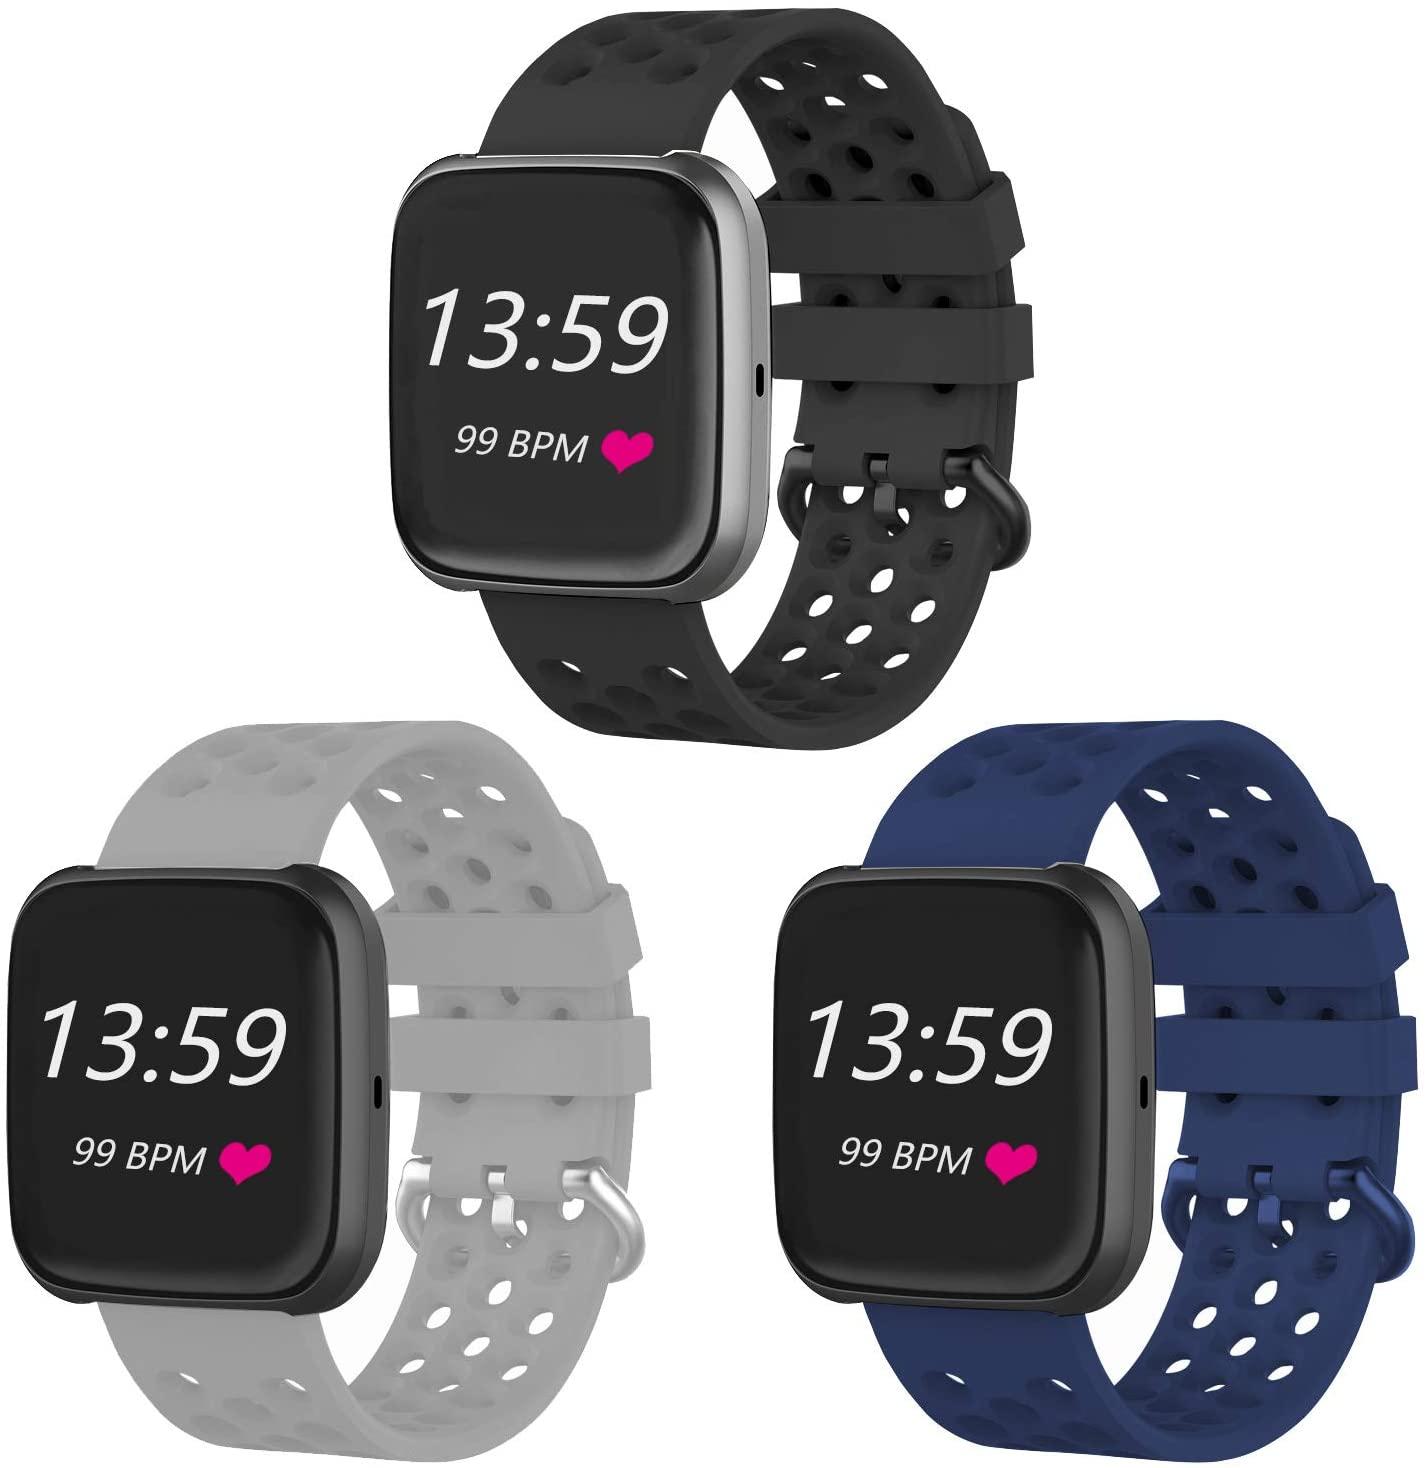 VINIKI 3Pcs Sport Bands Compatible with Fitbit Versa/Versa 2/Versa Lite/SE Special Edition Adjustable Sport Wristbands (Black,Grey,Dark Blue/Large Size)